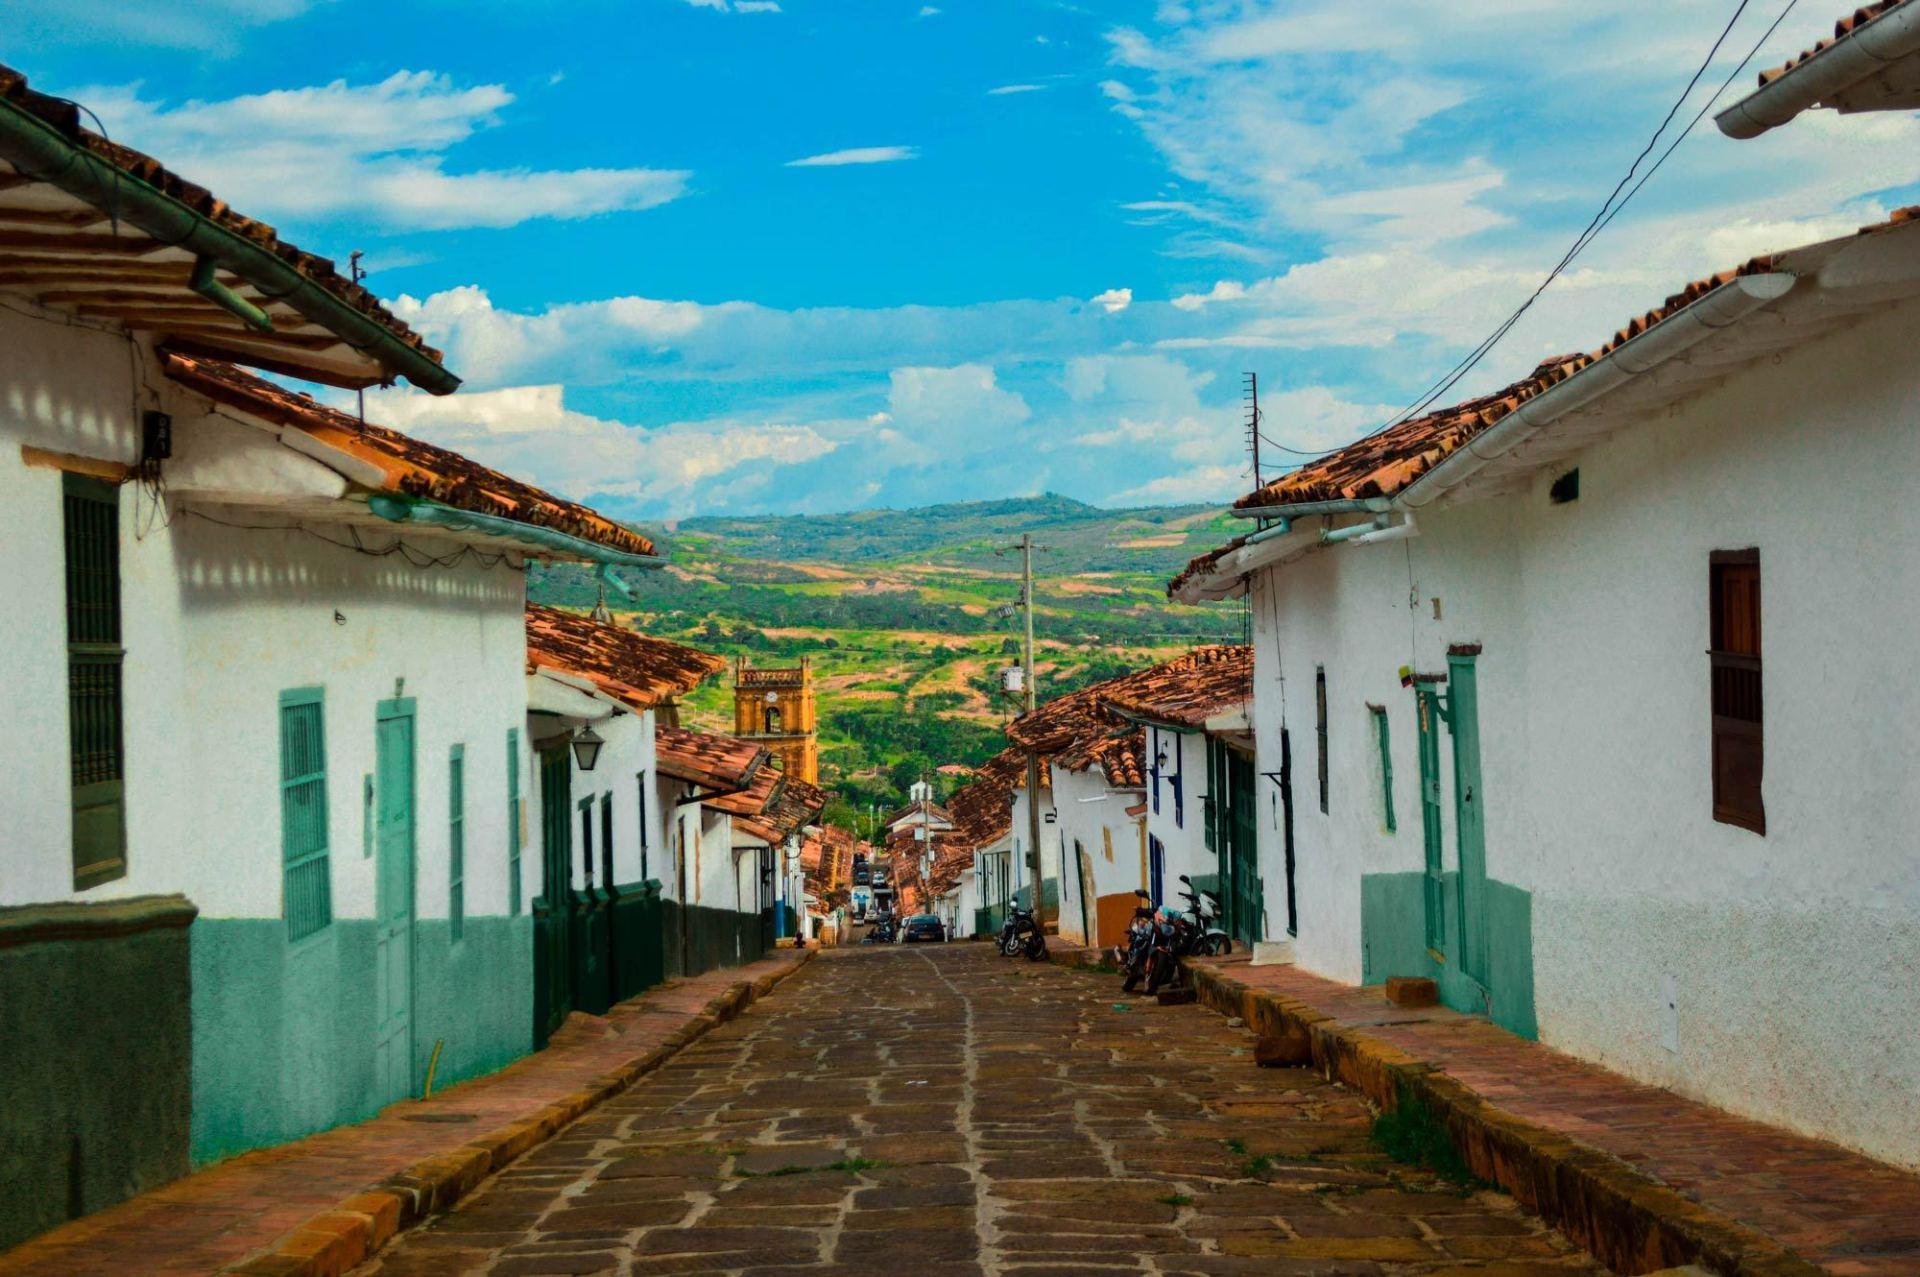 Salto del Mico. Barichara. Foto: www.beyondmyborder.com